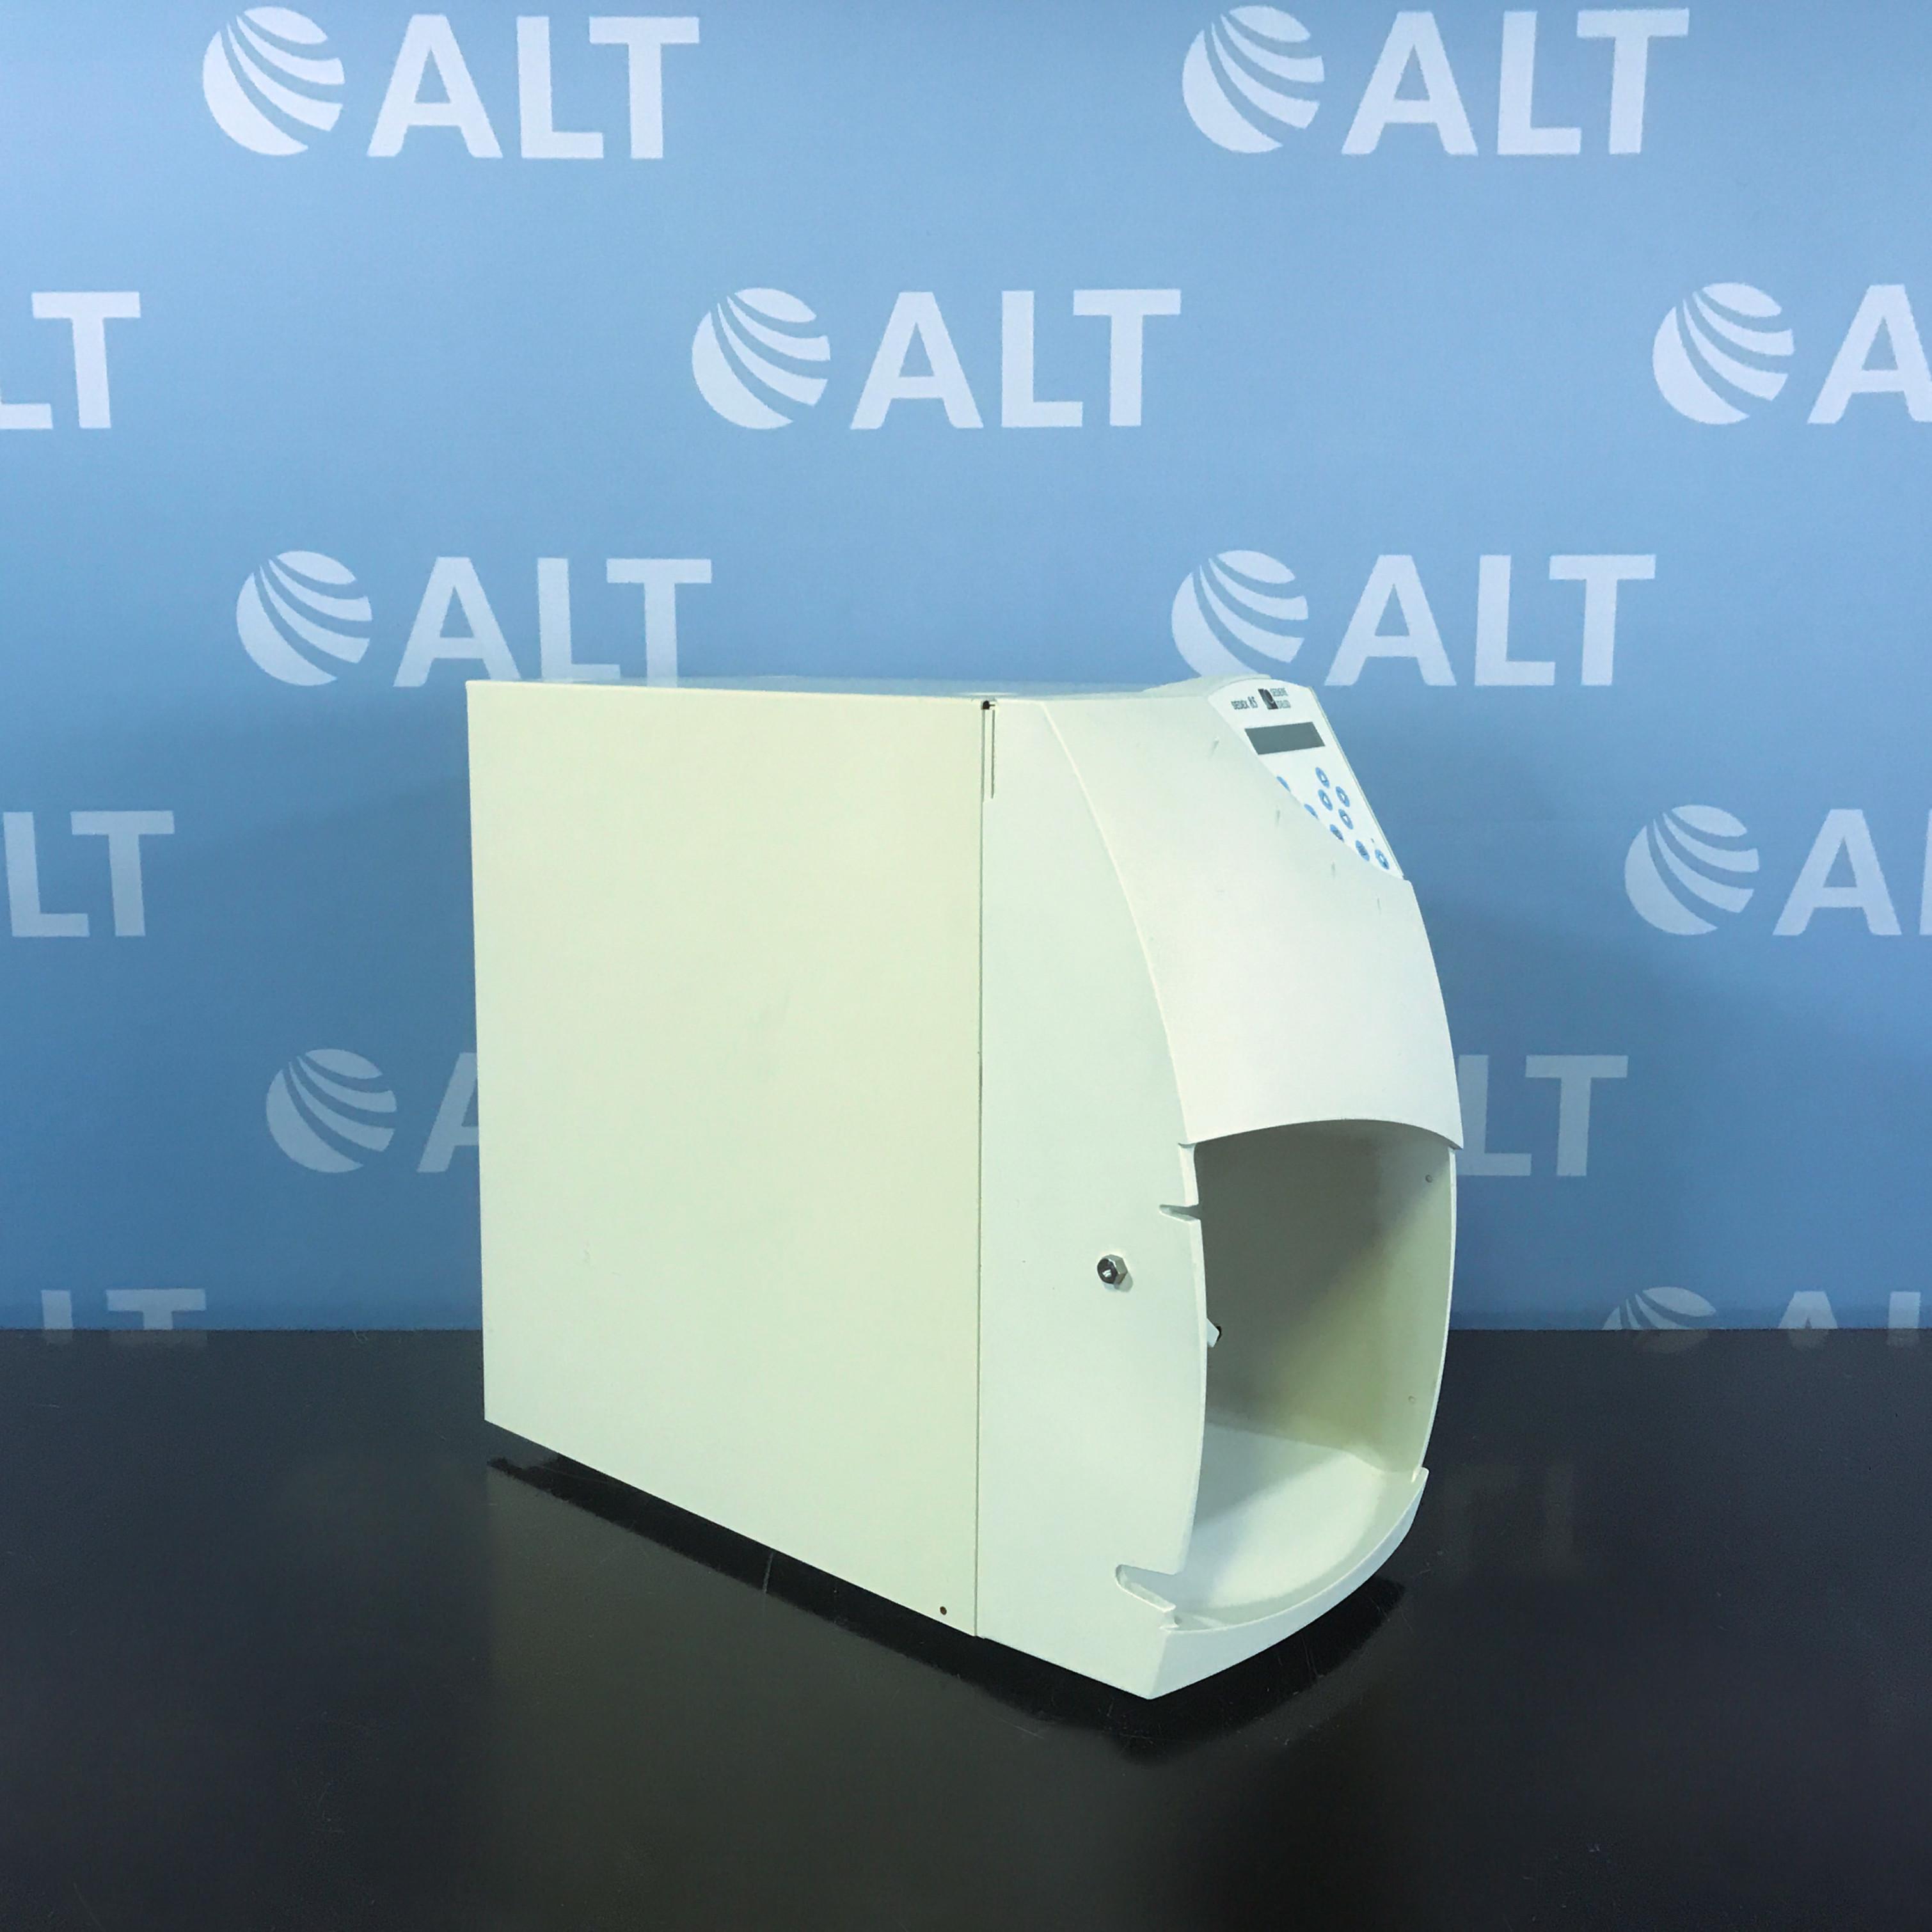 Sedere Model 85 LT-ELSD Evaporative Light-Scattering Detector Image